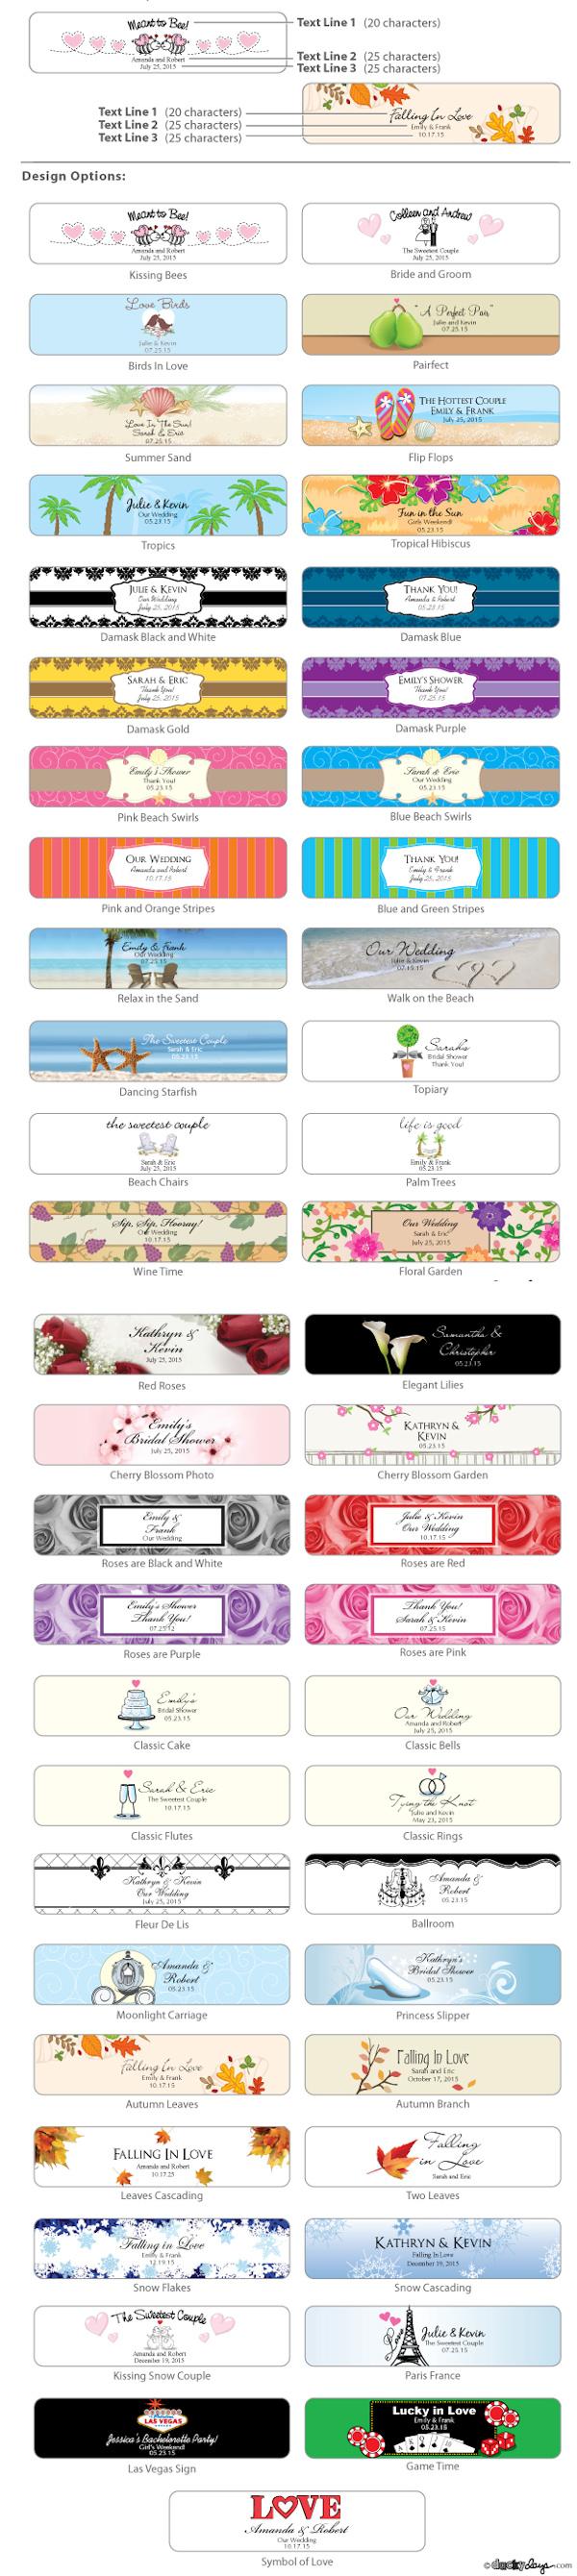 Personalized Honey Jar Wedding Favors (Many Designs) | Jar wedding ...